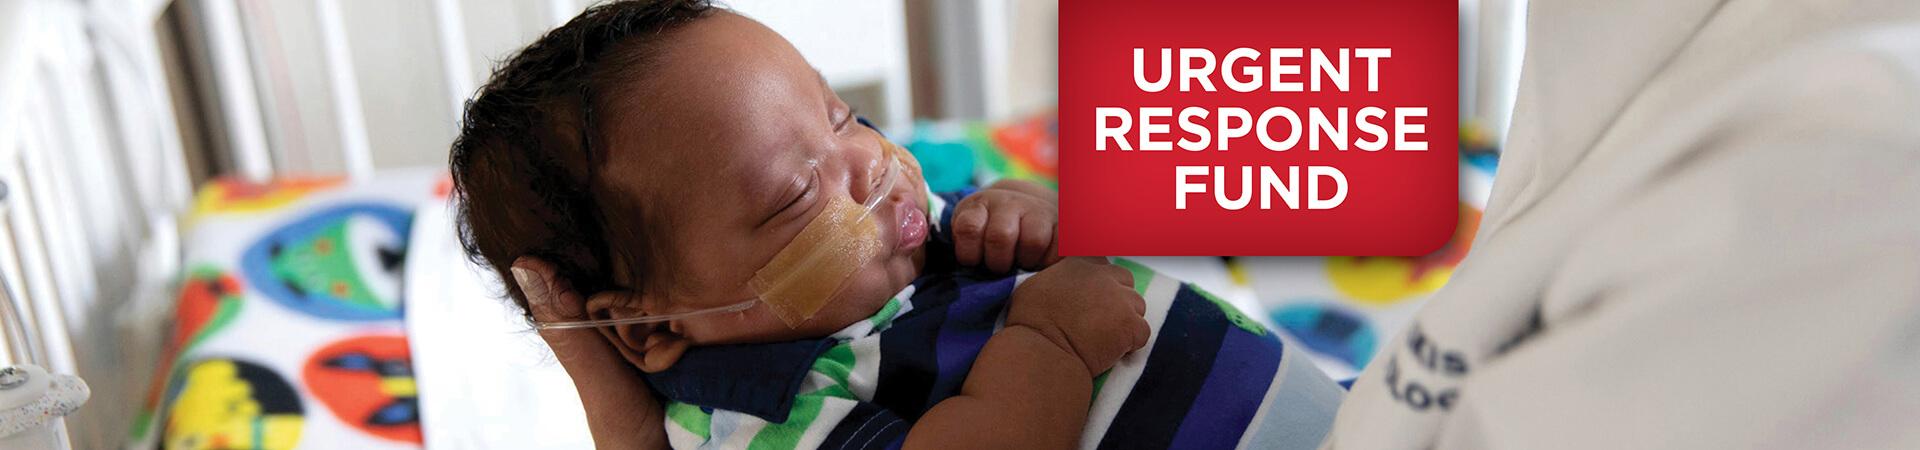 Cardinal Glennon NICU patient - Urgent Response Fund